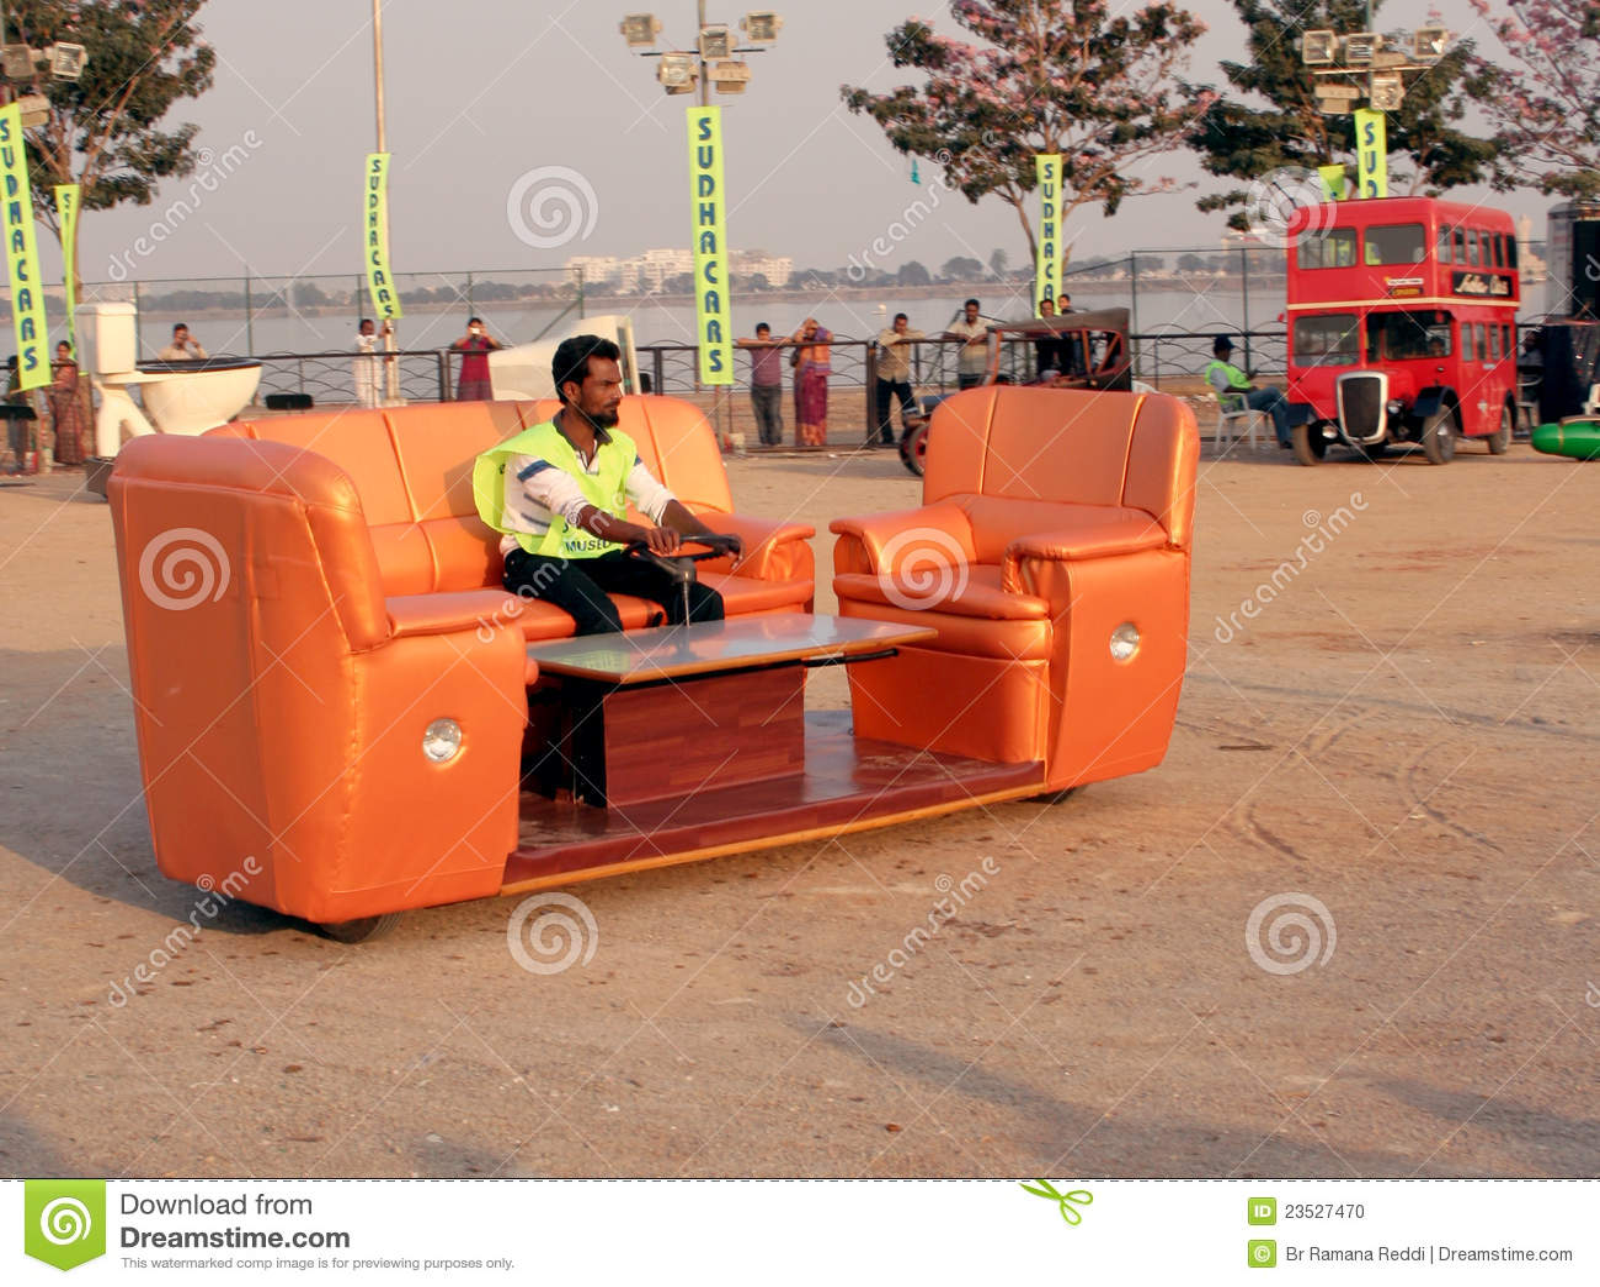 sofa gesetztes auto verr ckte autos redaktionelles bild bild 23527470. Black Bedroom Furniture Sets. Home Design Ideas